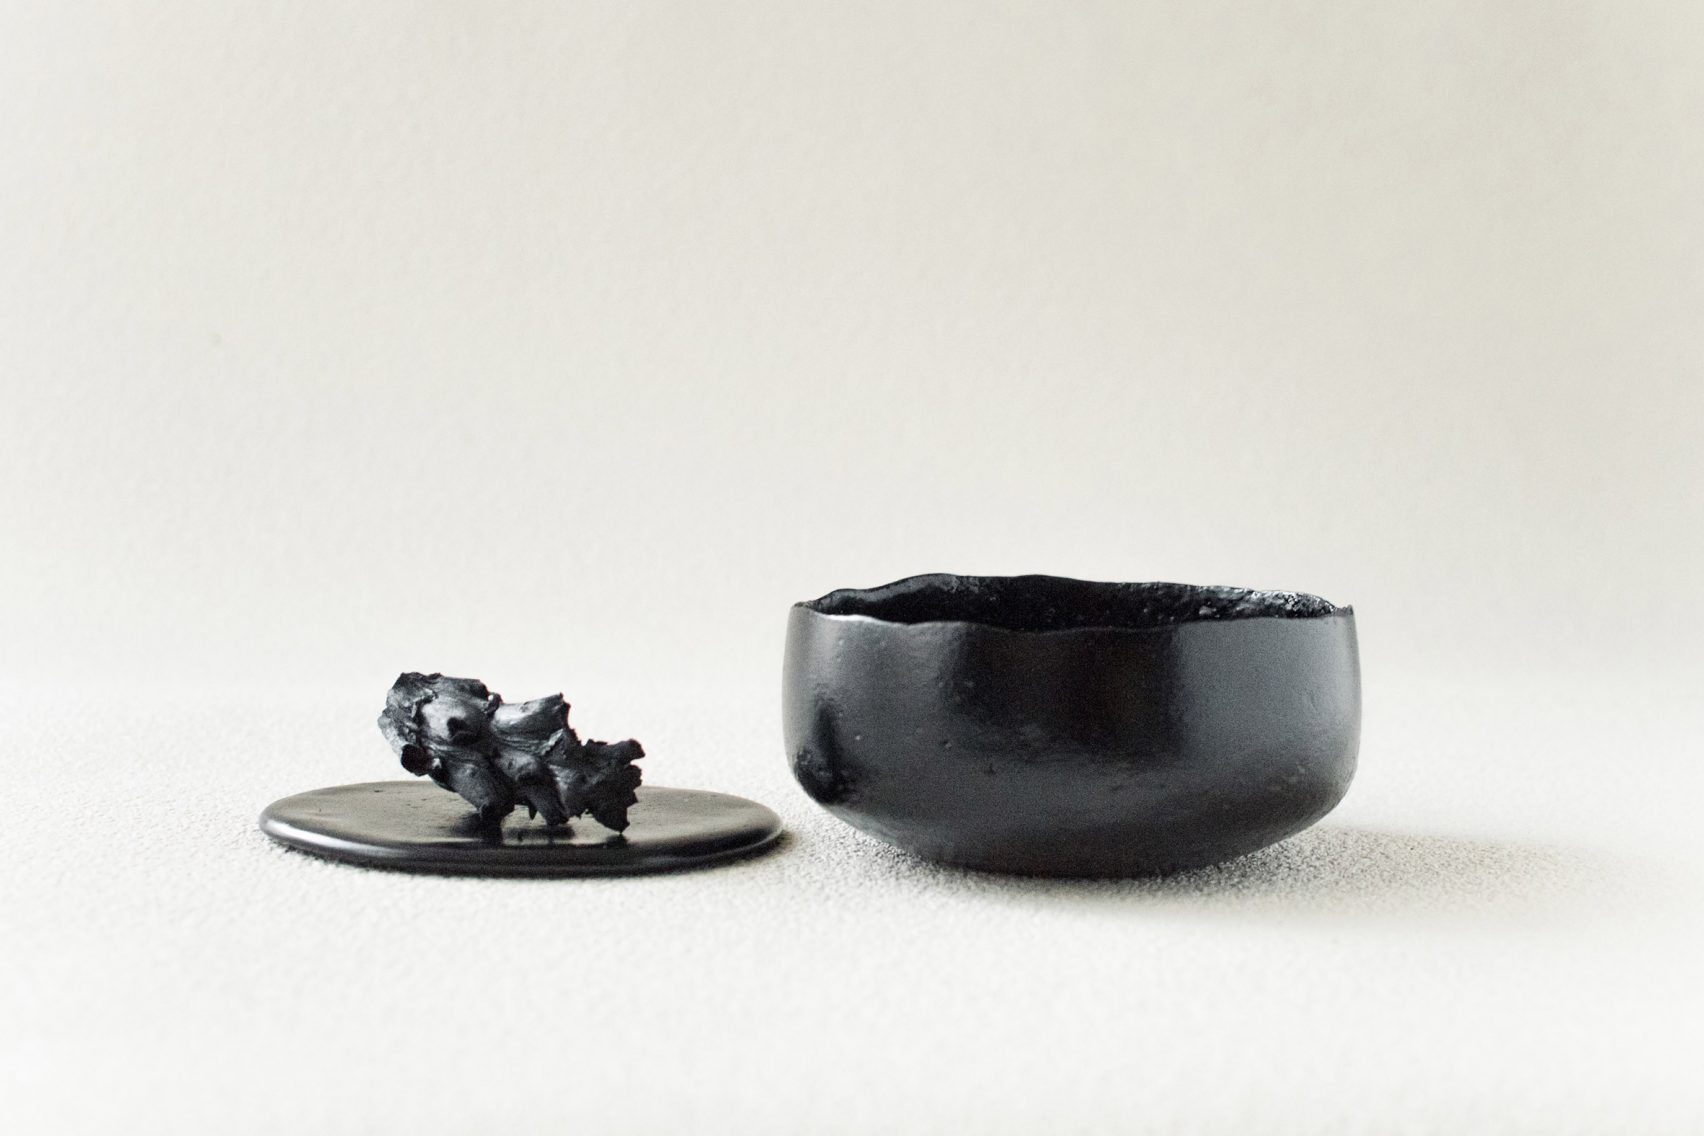 food waste ware kosuke araki homware tableware design dezeen 2364 col 1 1704x1136